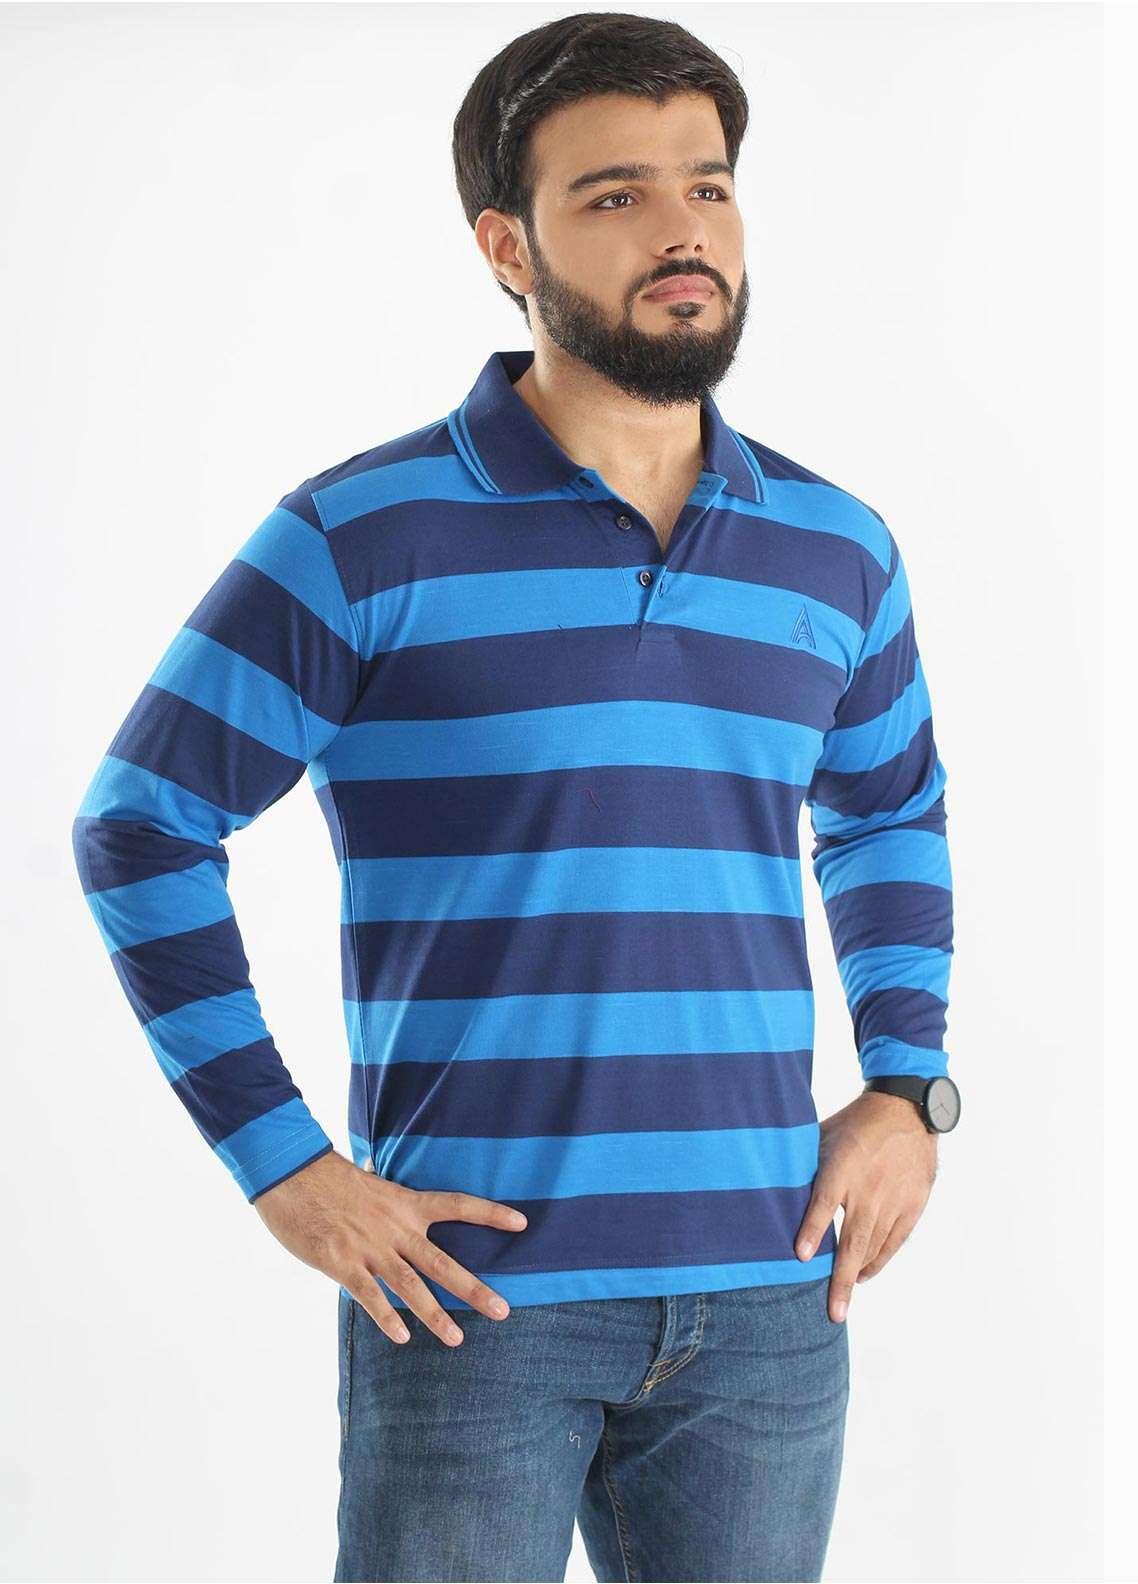 Anchor Jersey Polo Men T-Shirts - Multi A-211